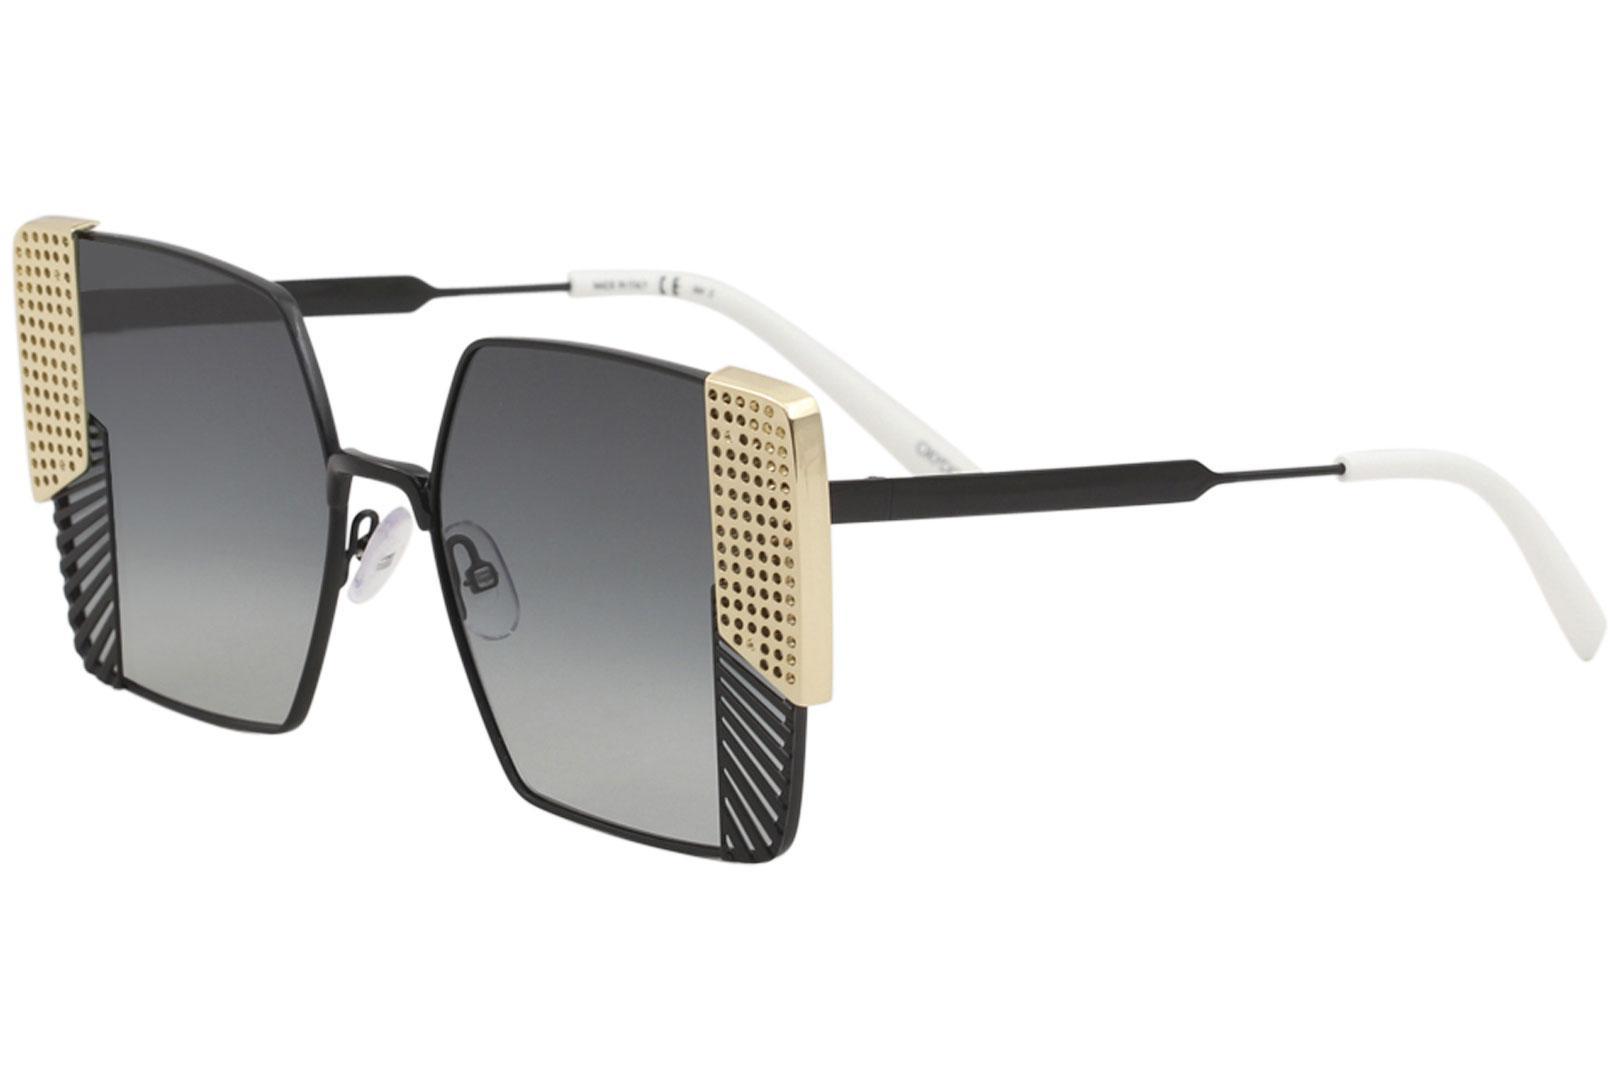 Oxydo Women s O.No 2.1 8071L 807 1L Full Rim Fashion Butterfly Sunglasses b09d4e5556